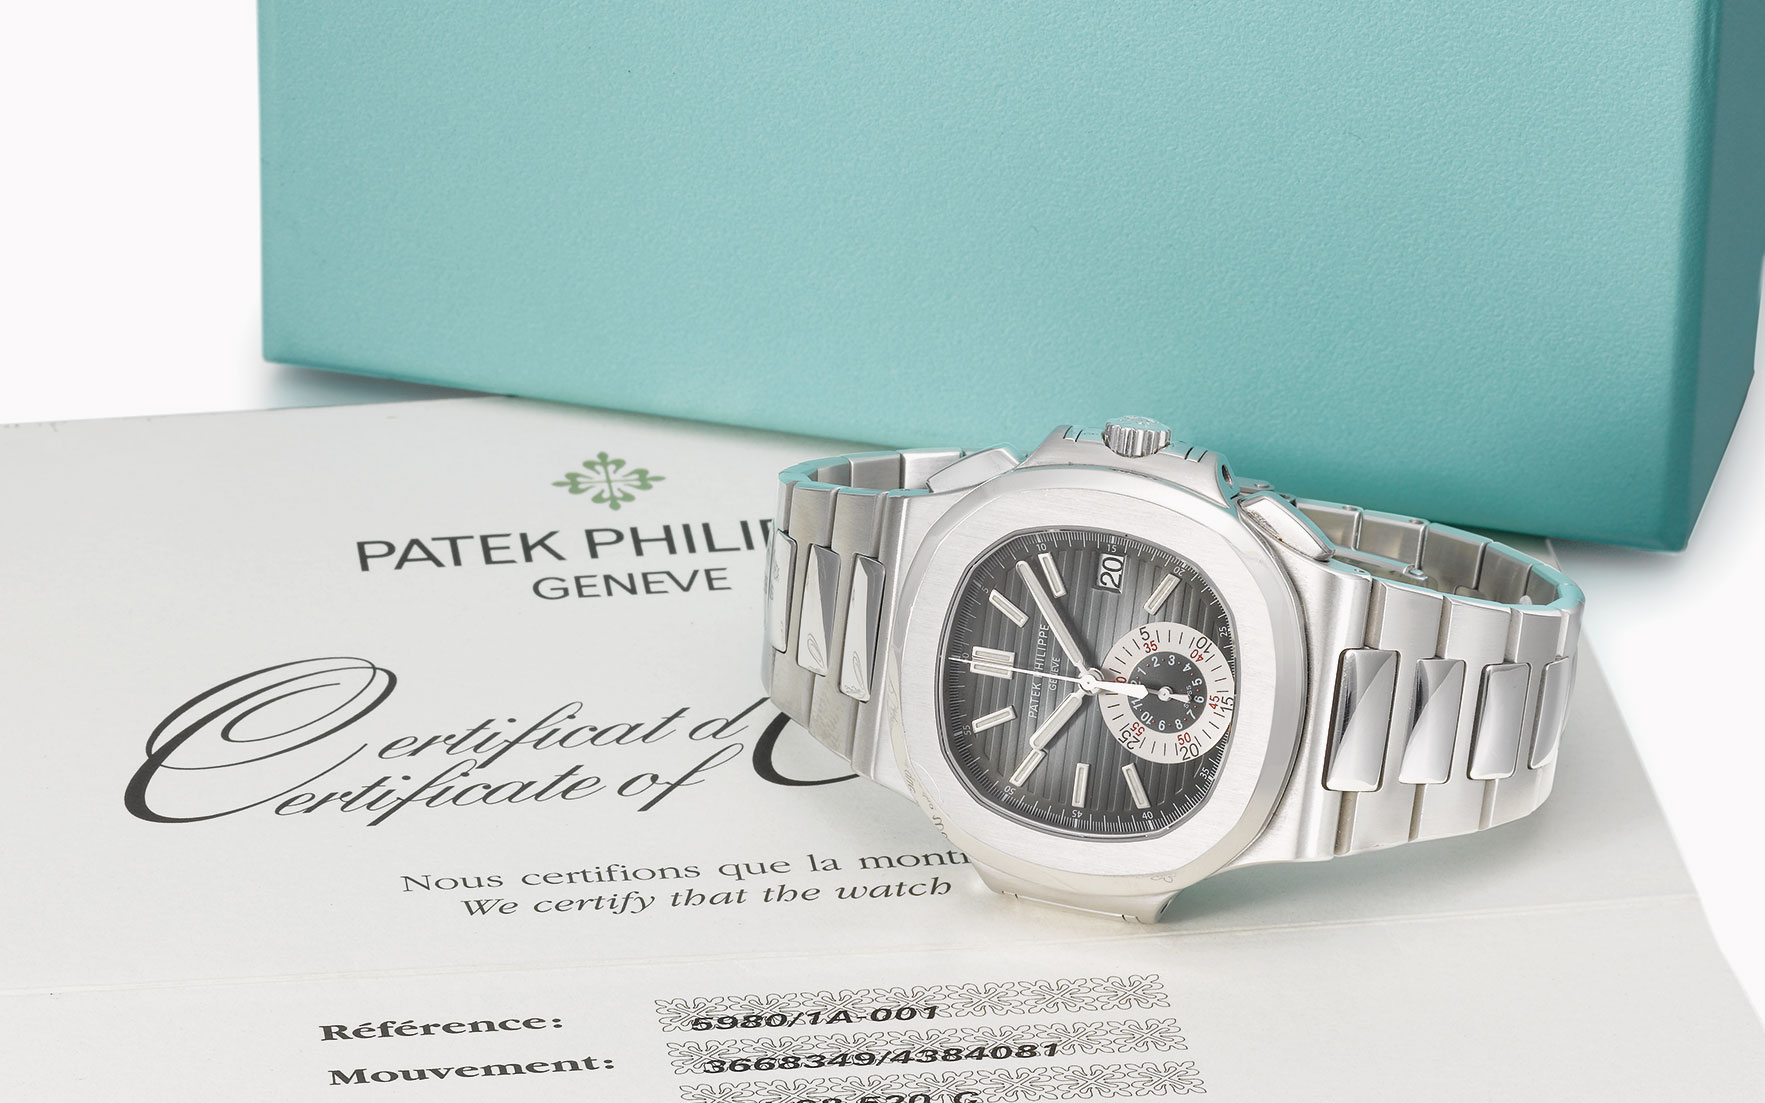 Secrets of the Patek Philippe&